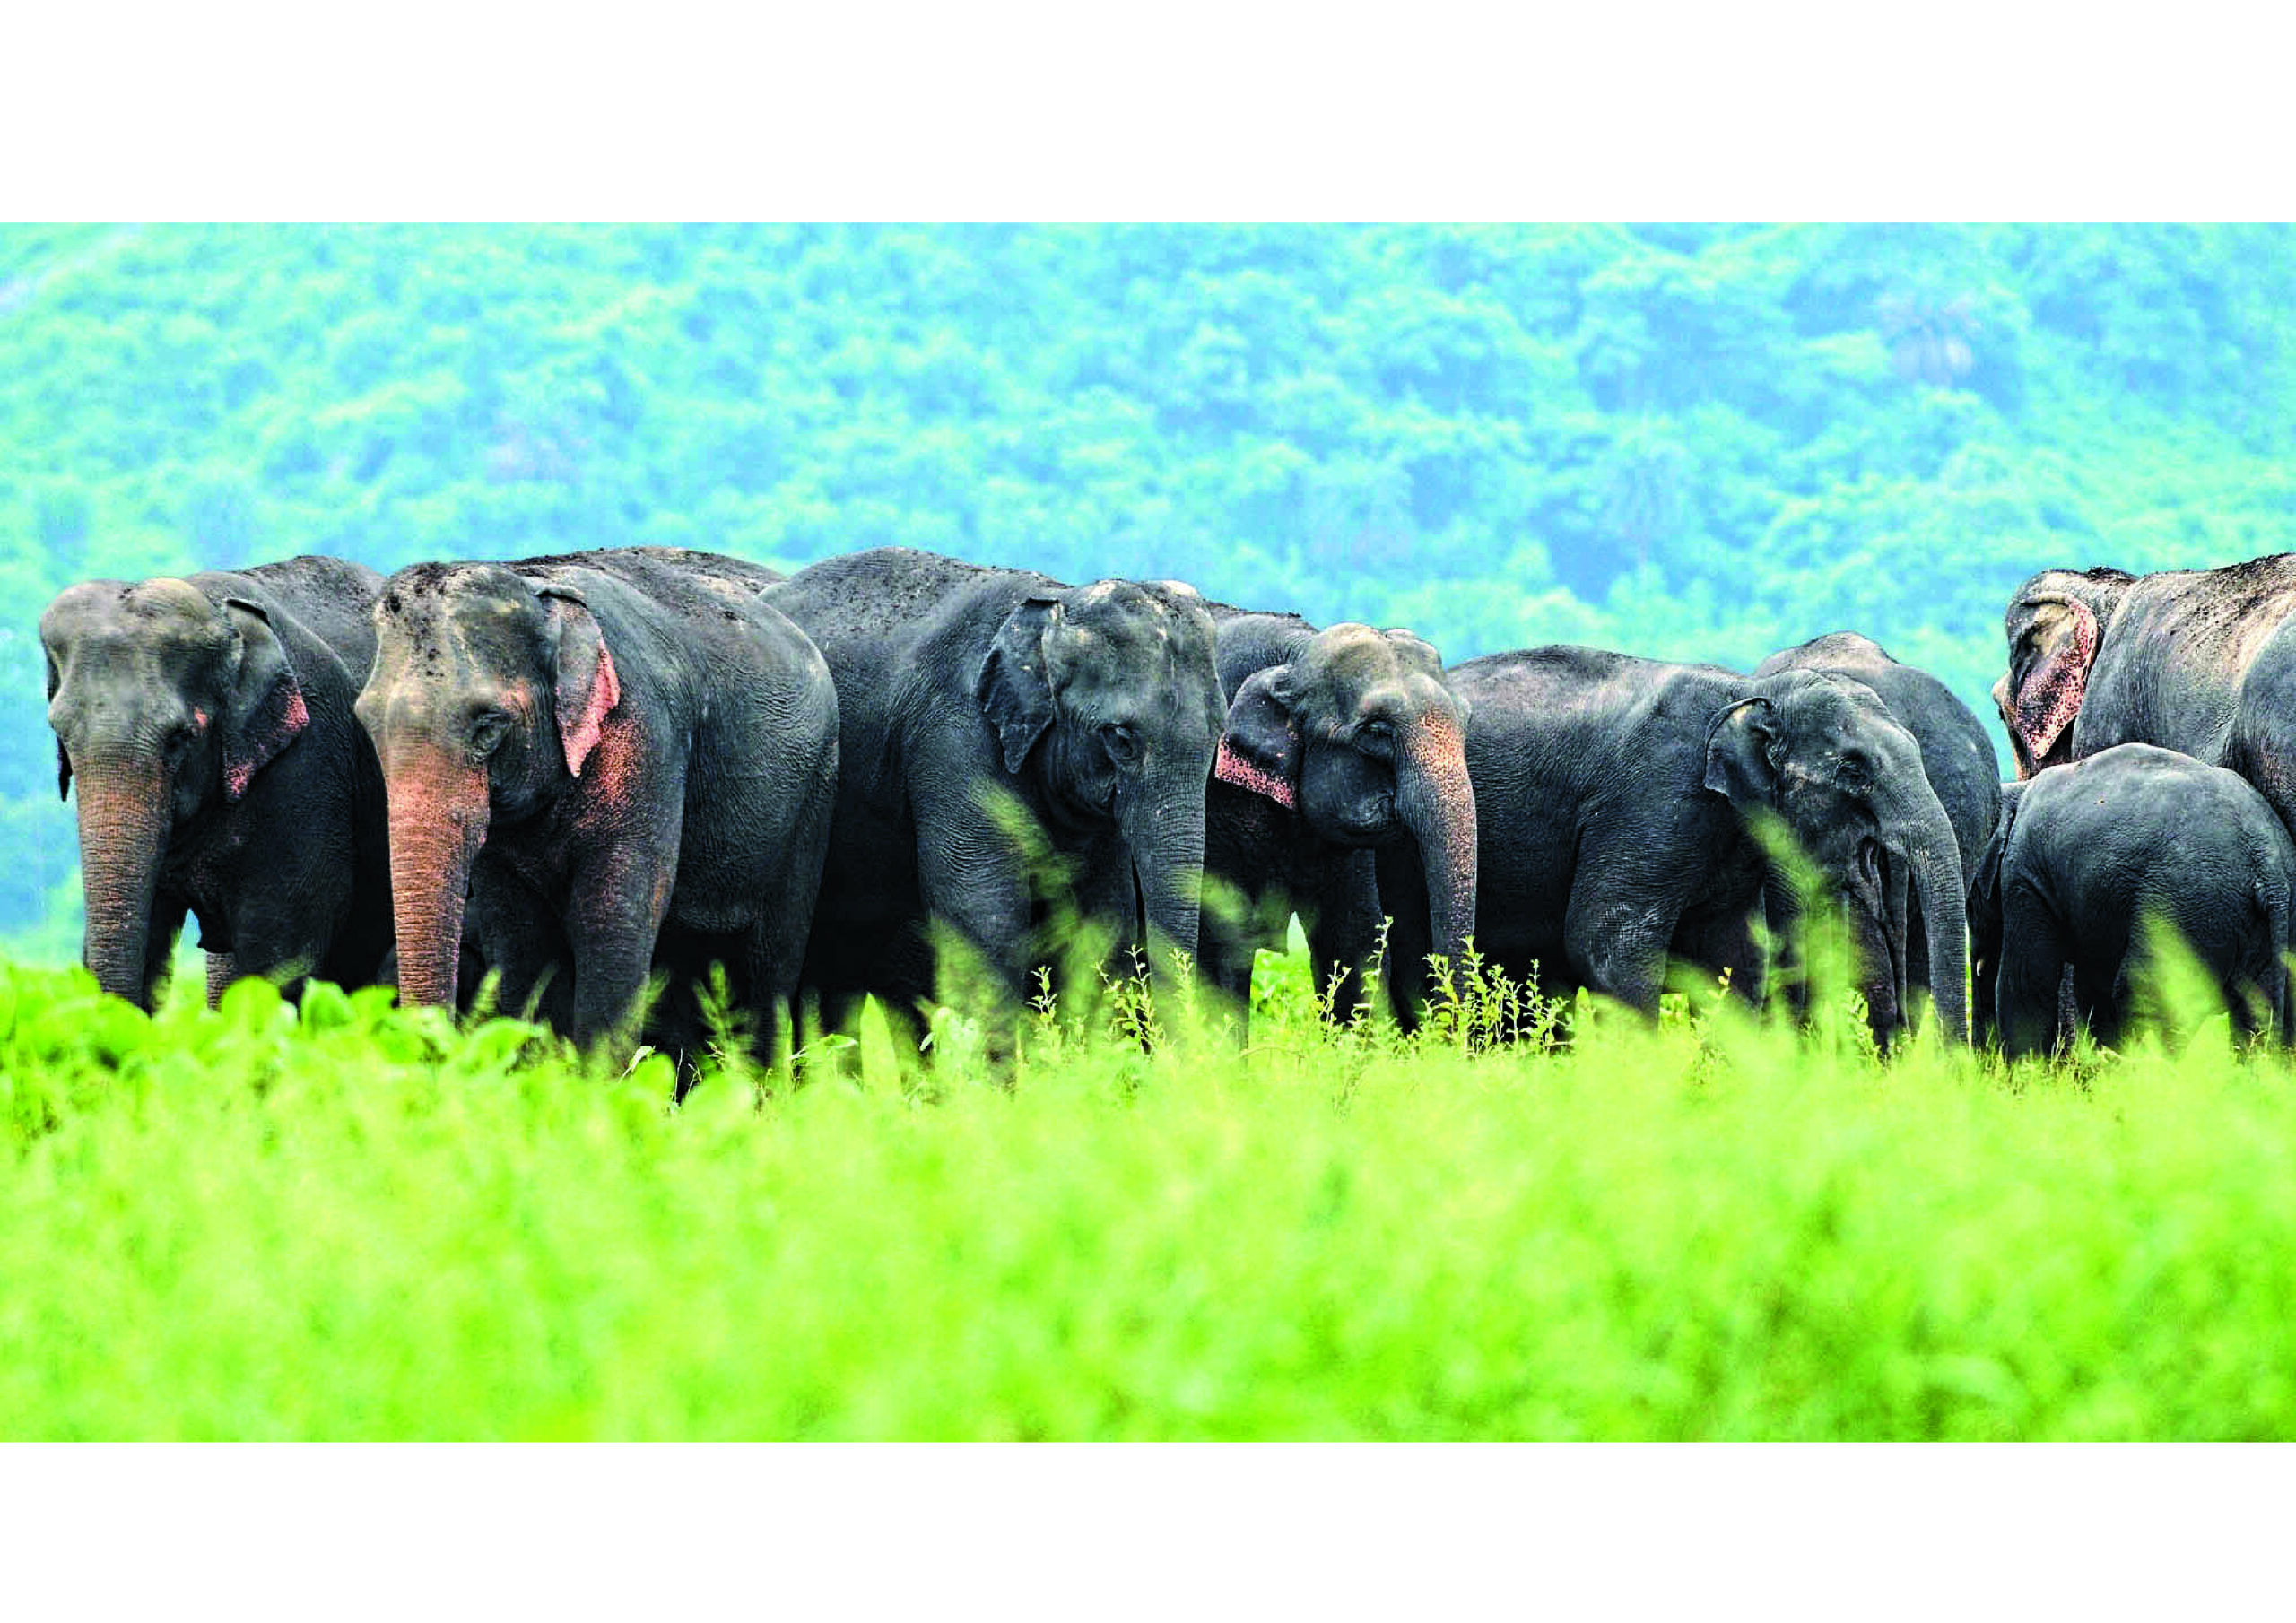 India: Culture & Wildlife of North East